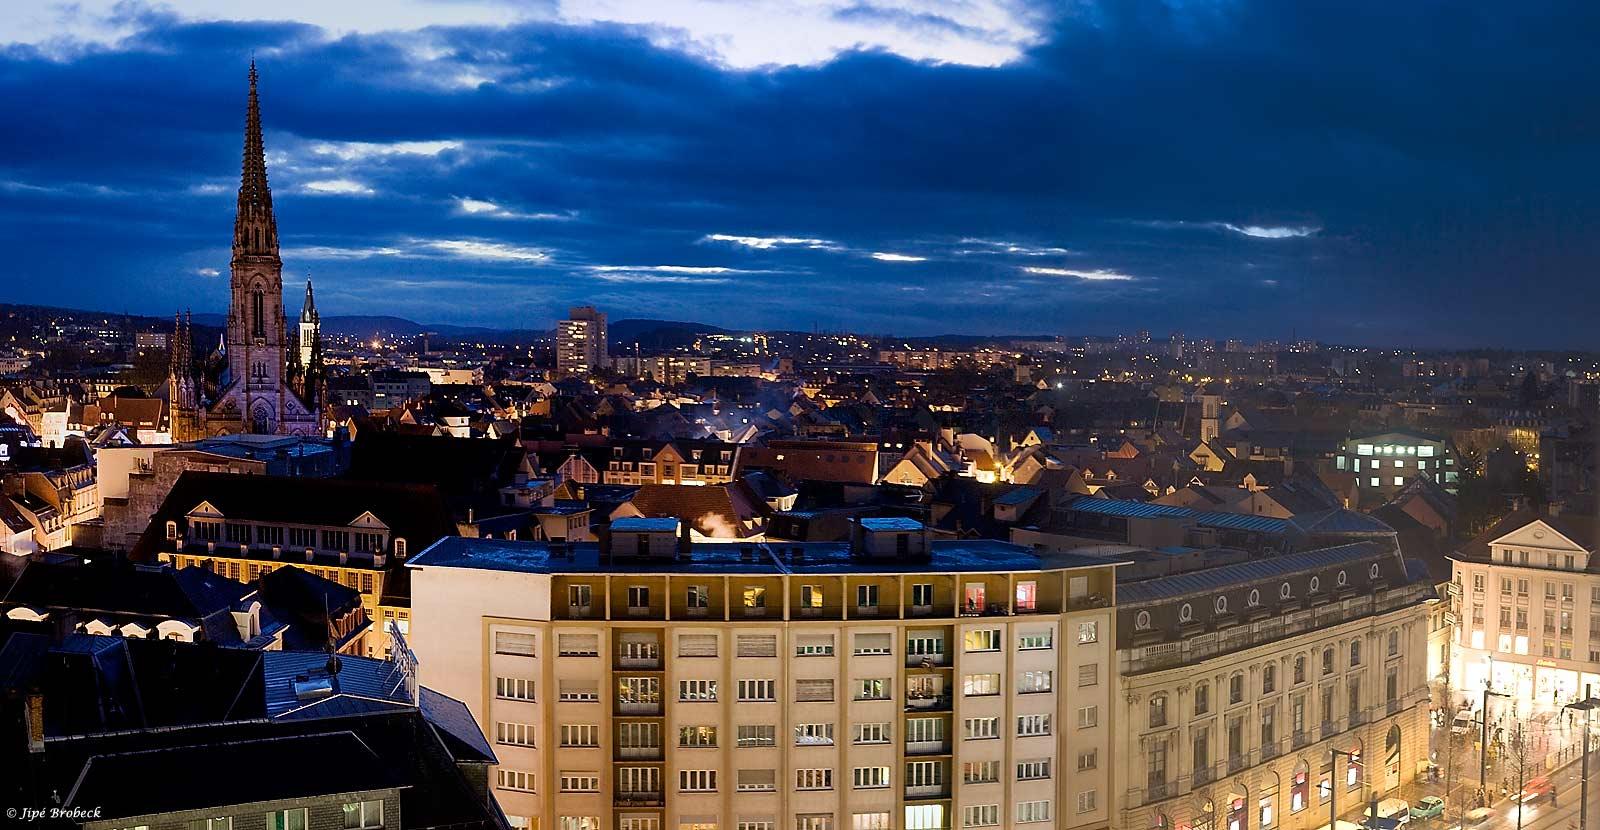 Panorama du soir... Bonsoir ! Panora16